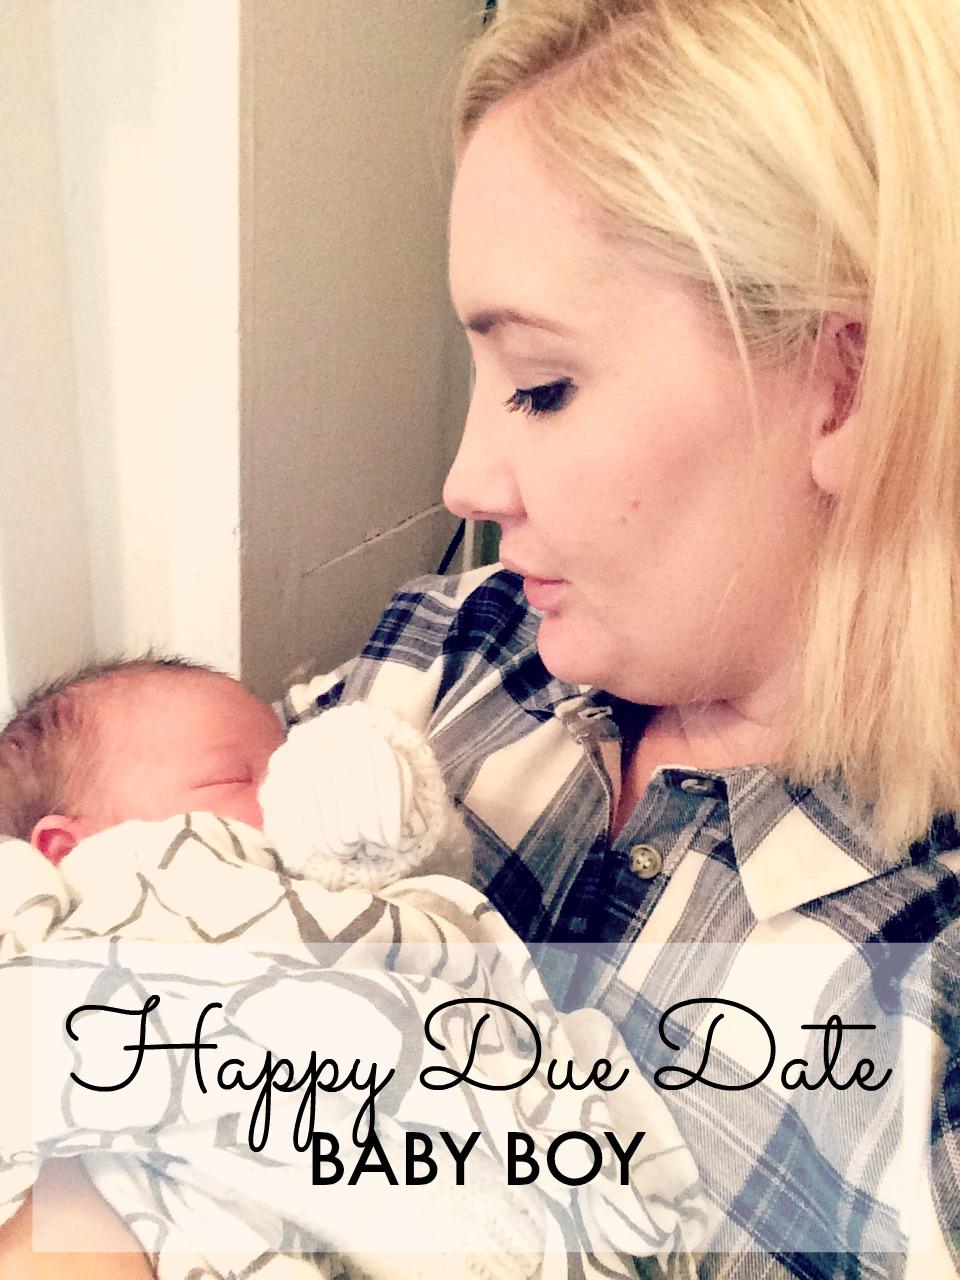 DUE DATE BABY BOY PIN